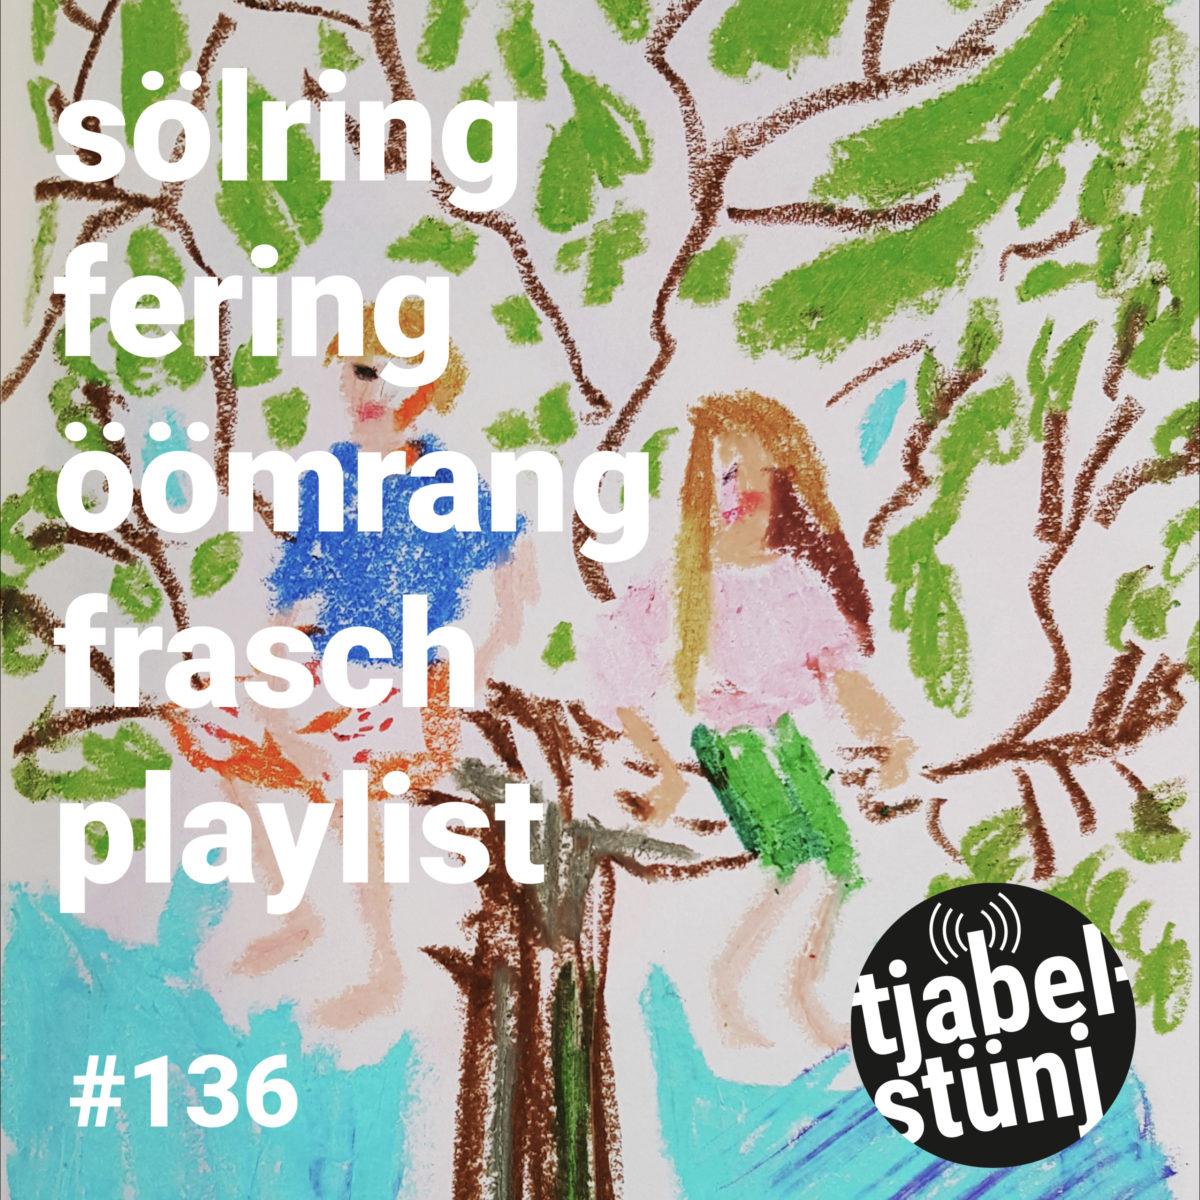 Playlist #136